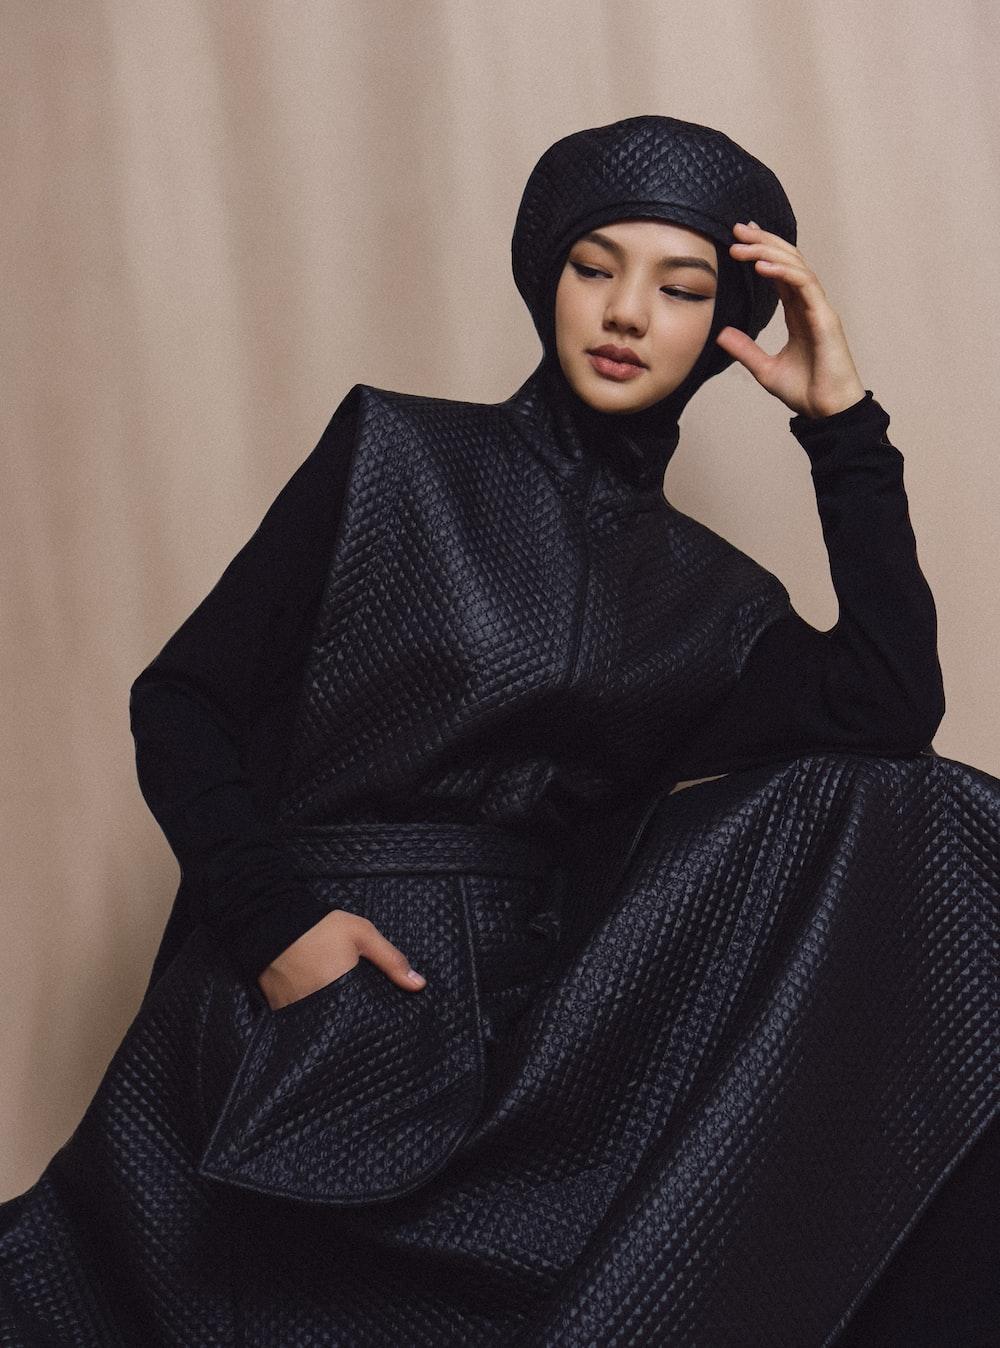 woman in black long sleeve dress and black hijab